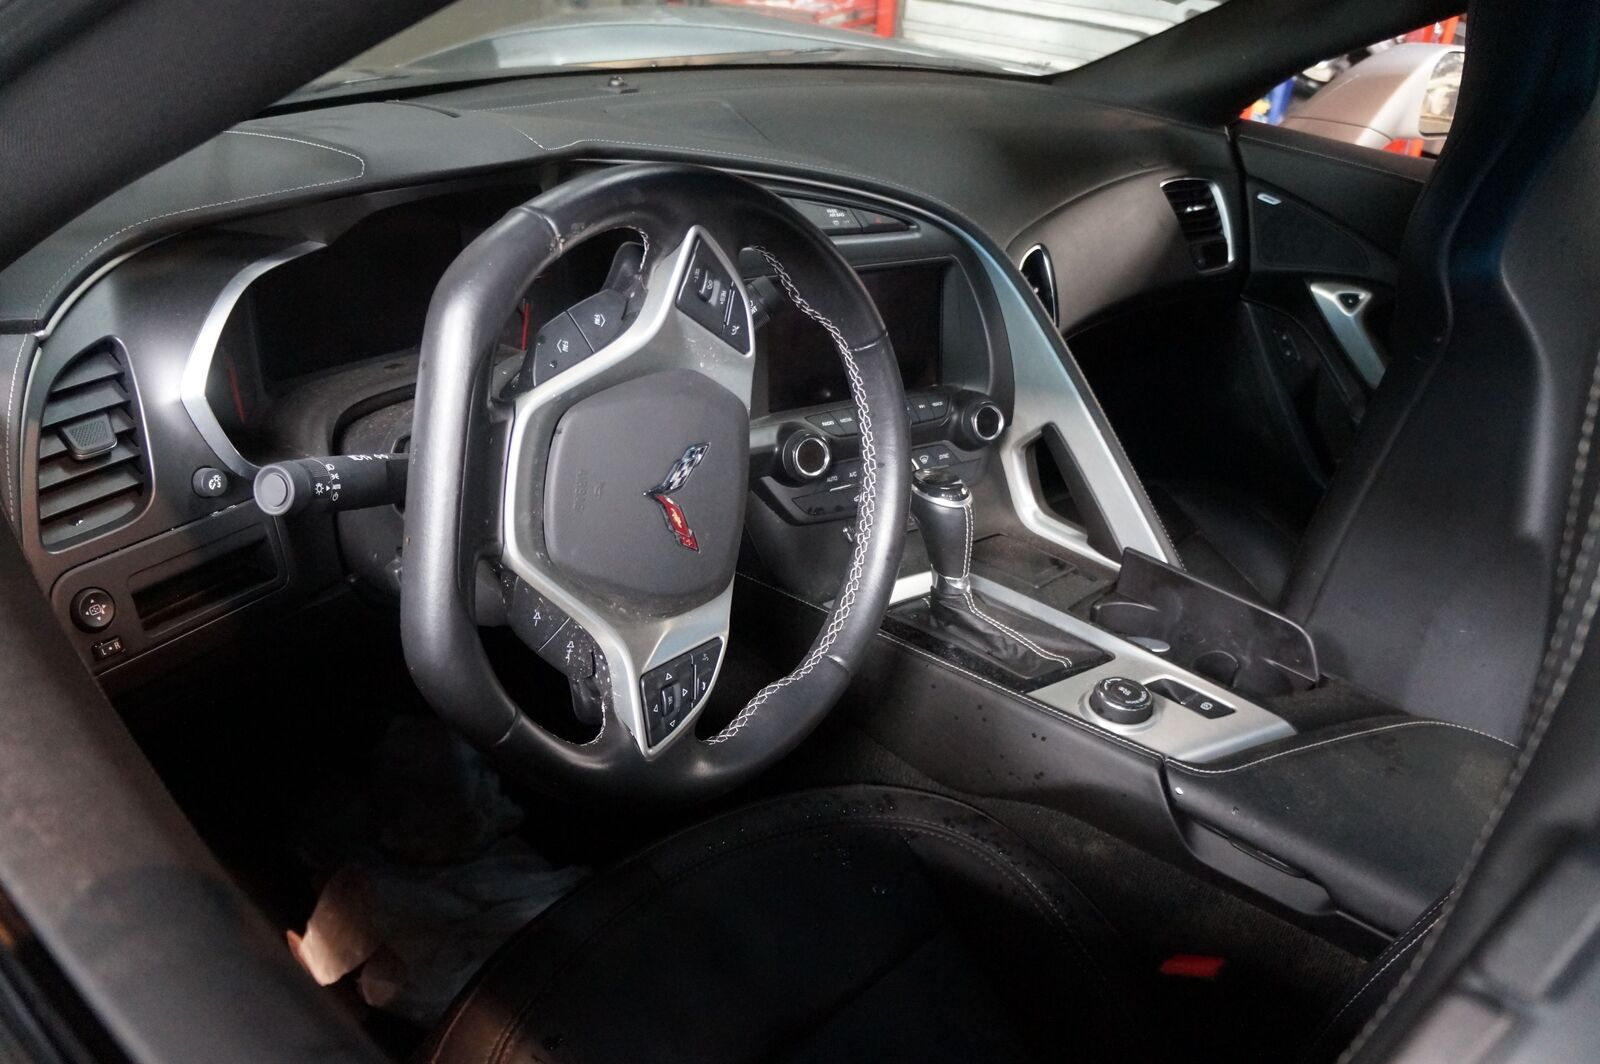 Body Fuse Box Relay Junction Terminal 23301924 Oem Chevrolet C7 Corvette